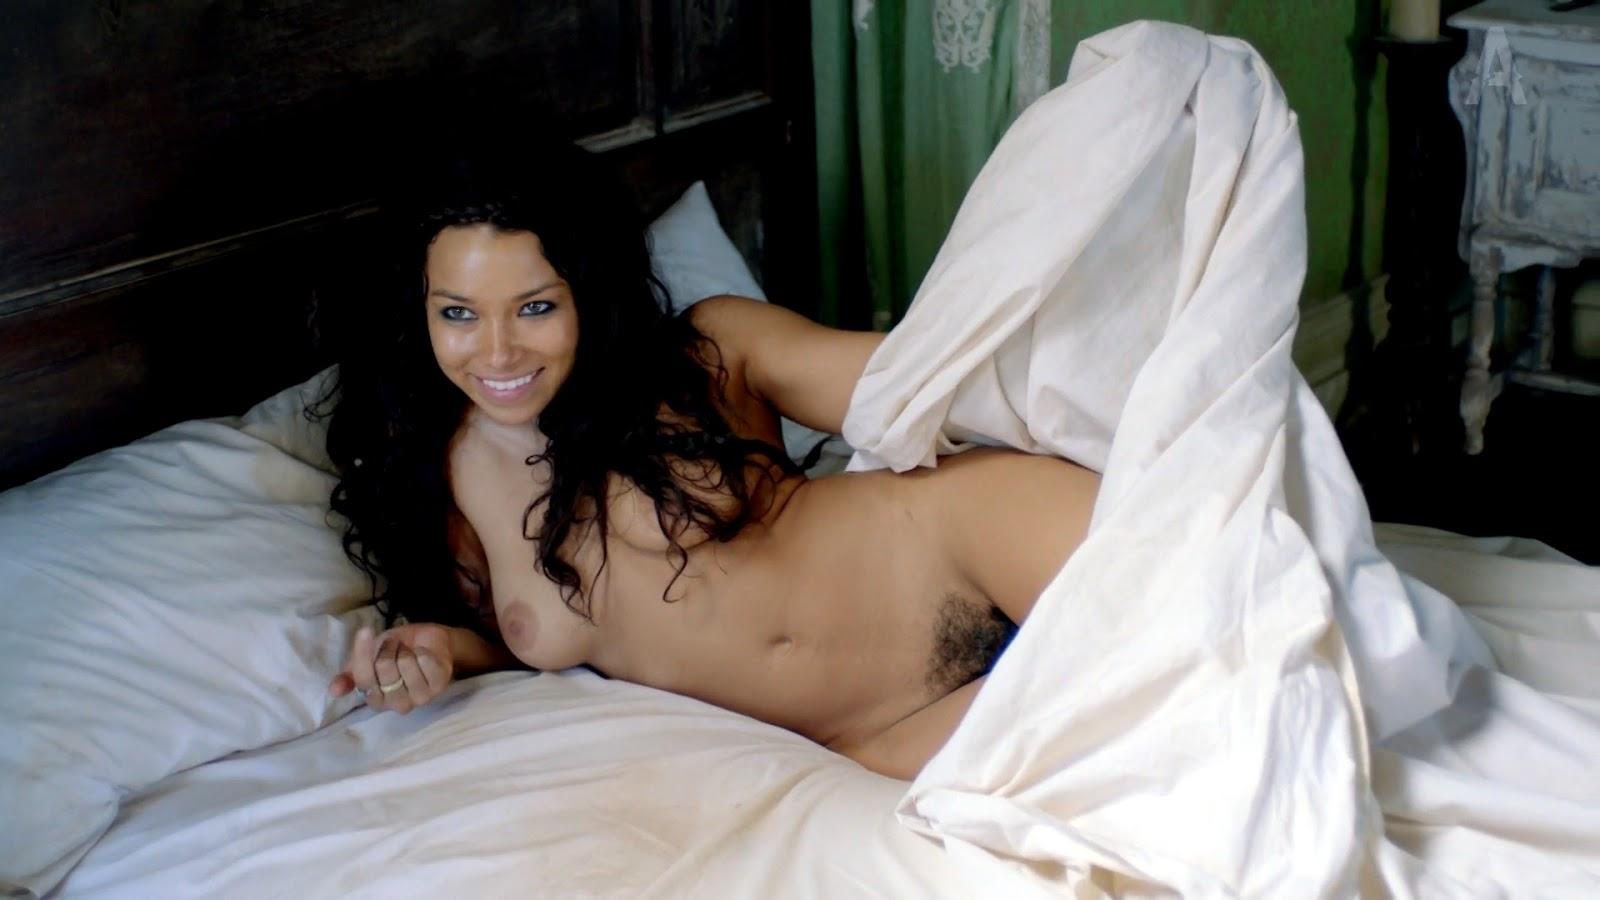 eroticheskiy-rasskaz-dekameron